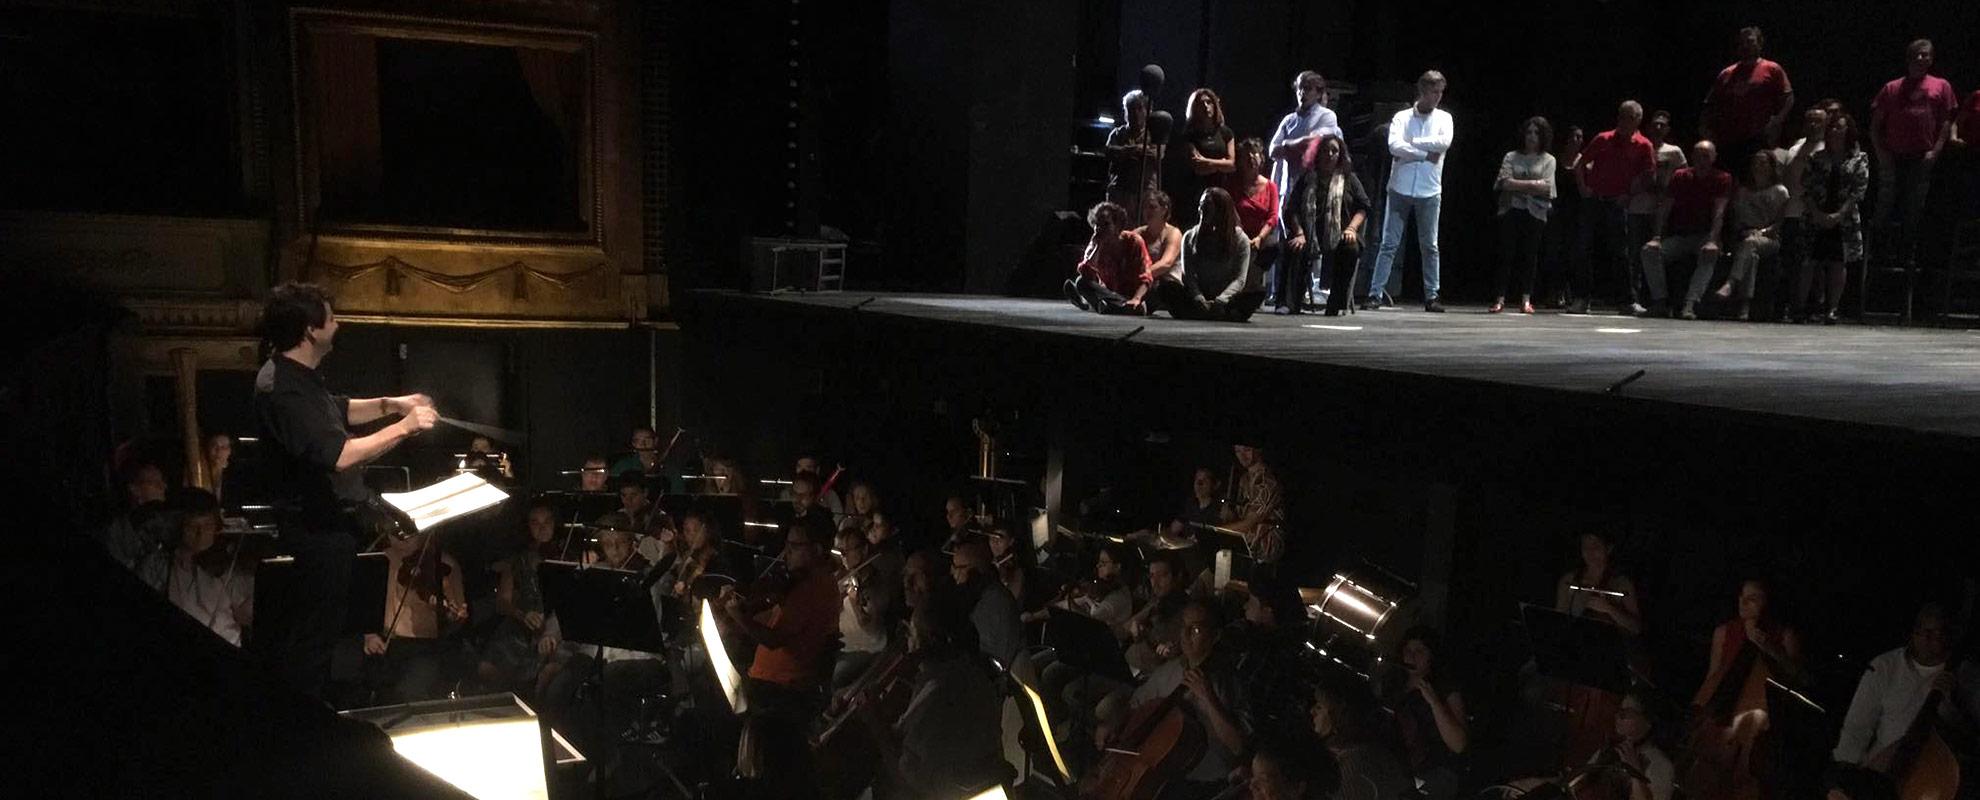 las-golondrinas-oliver-diaz-teatro-zarzuela